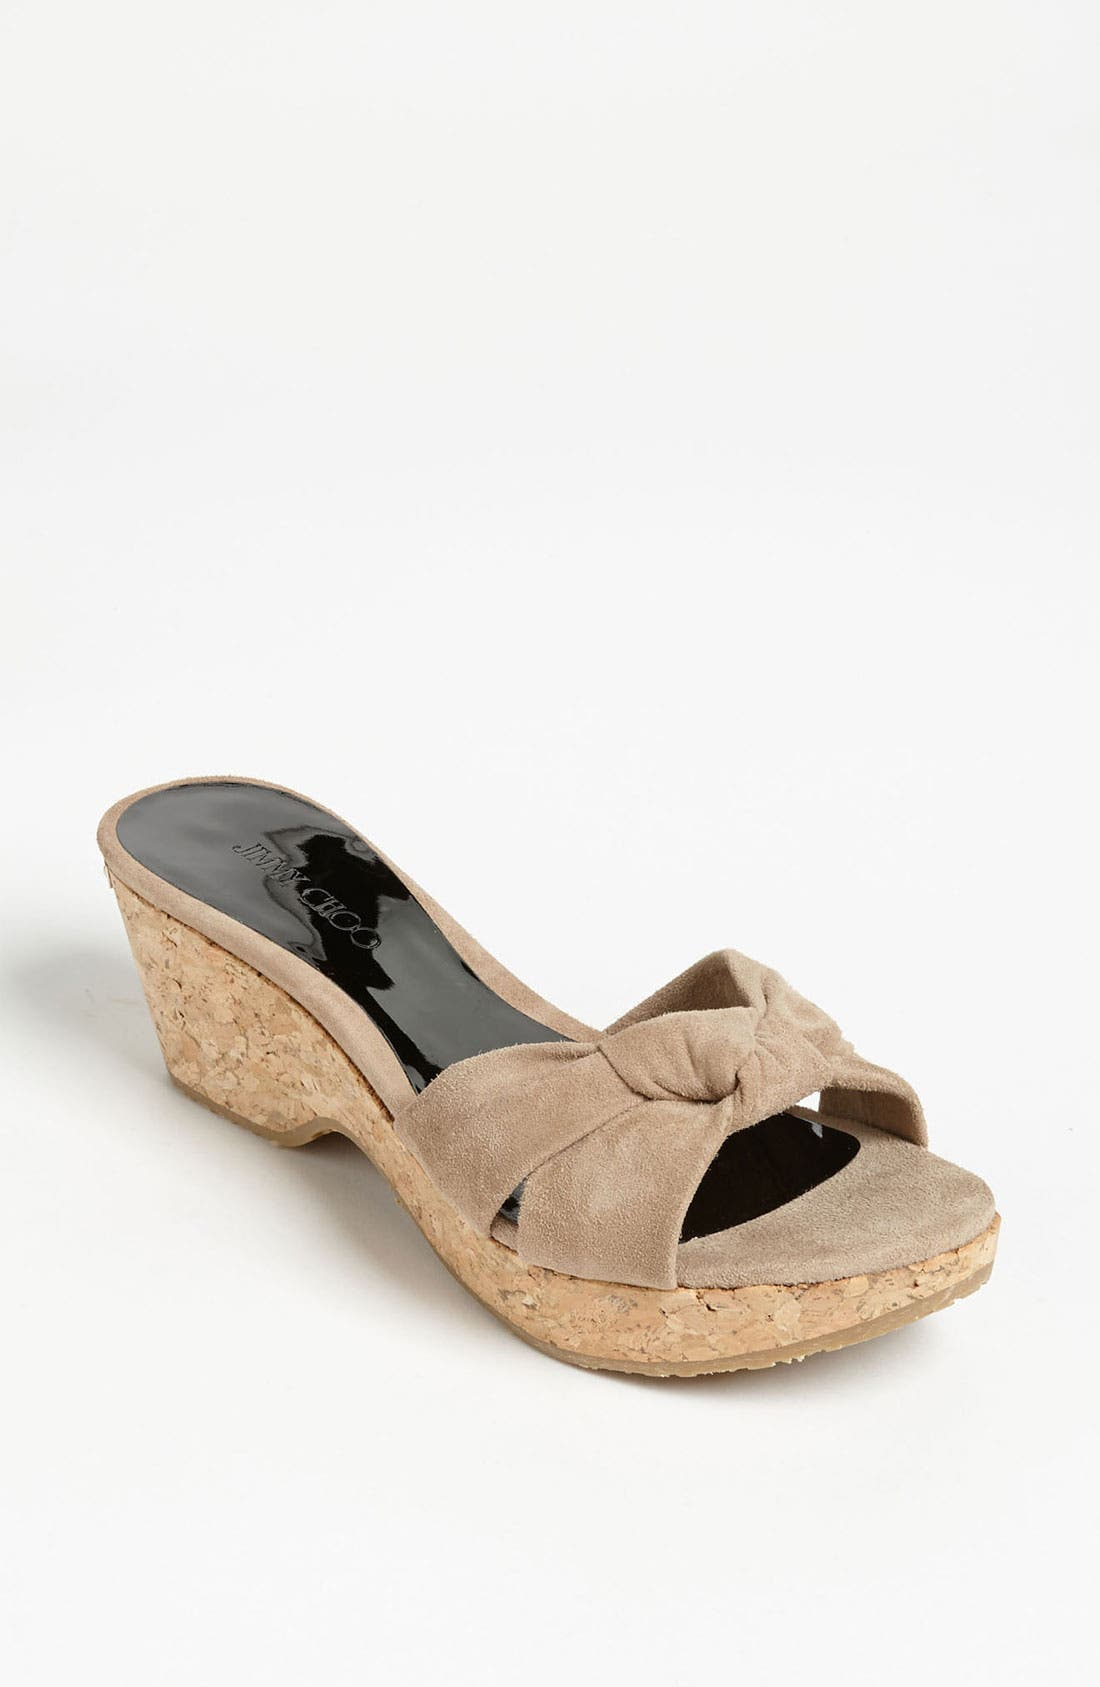 Alternate Image 1 Selected - Jimmy Choo 'Glace' Slide Sandal